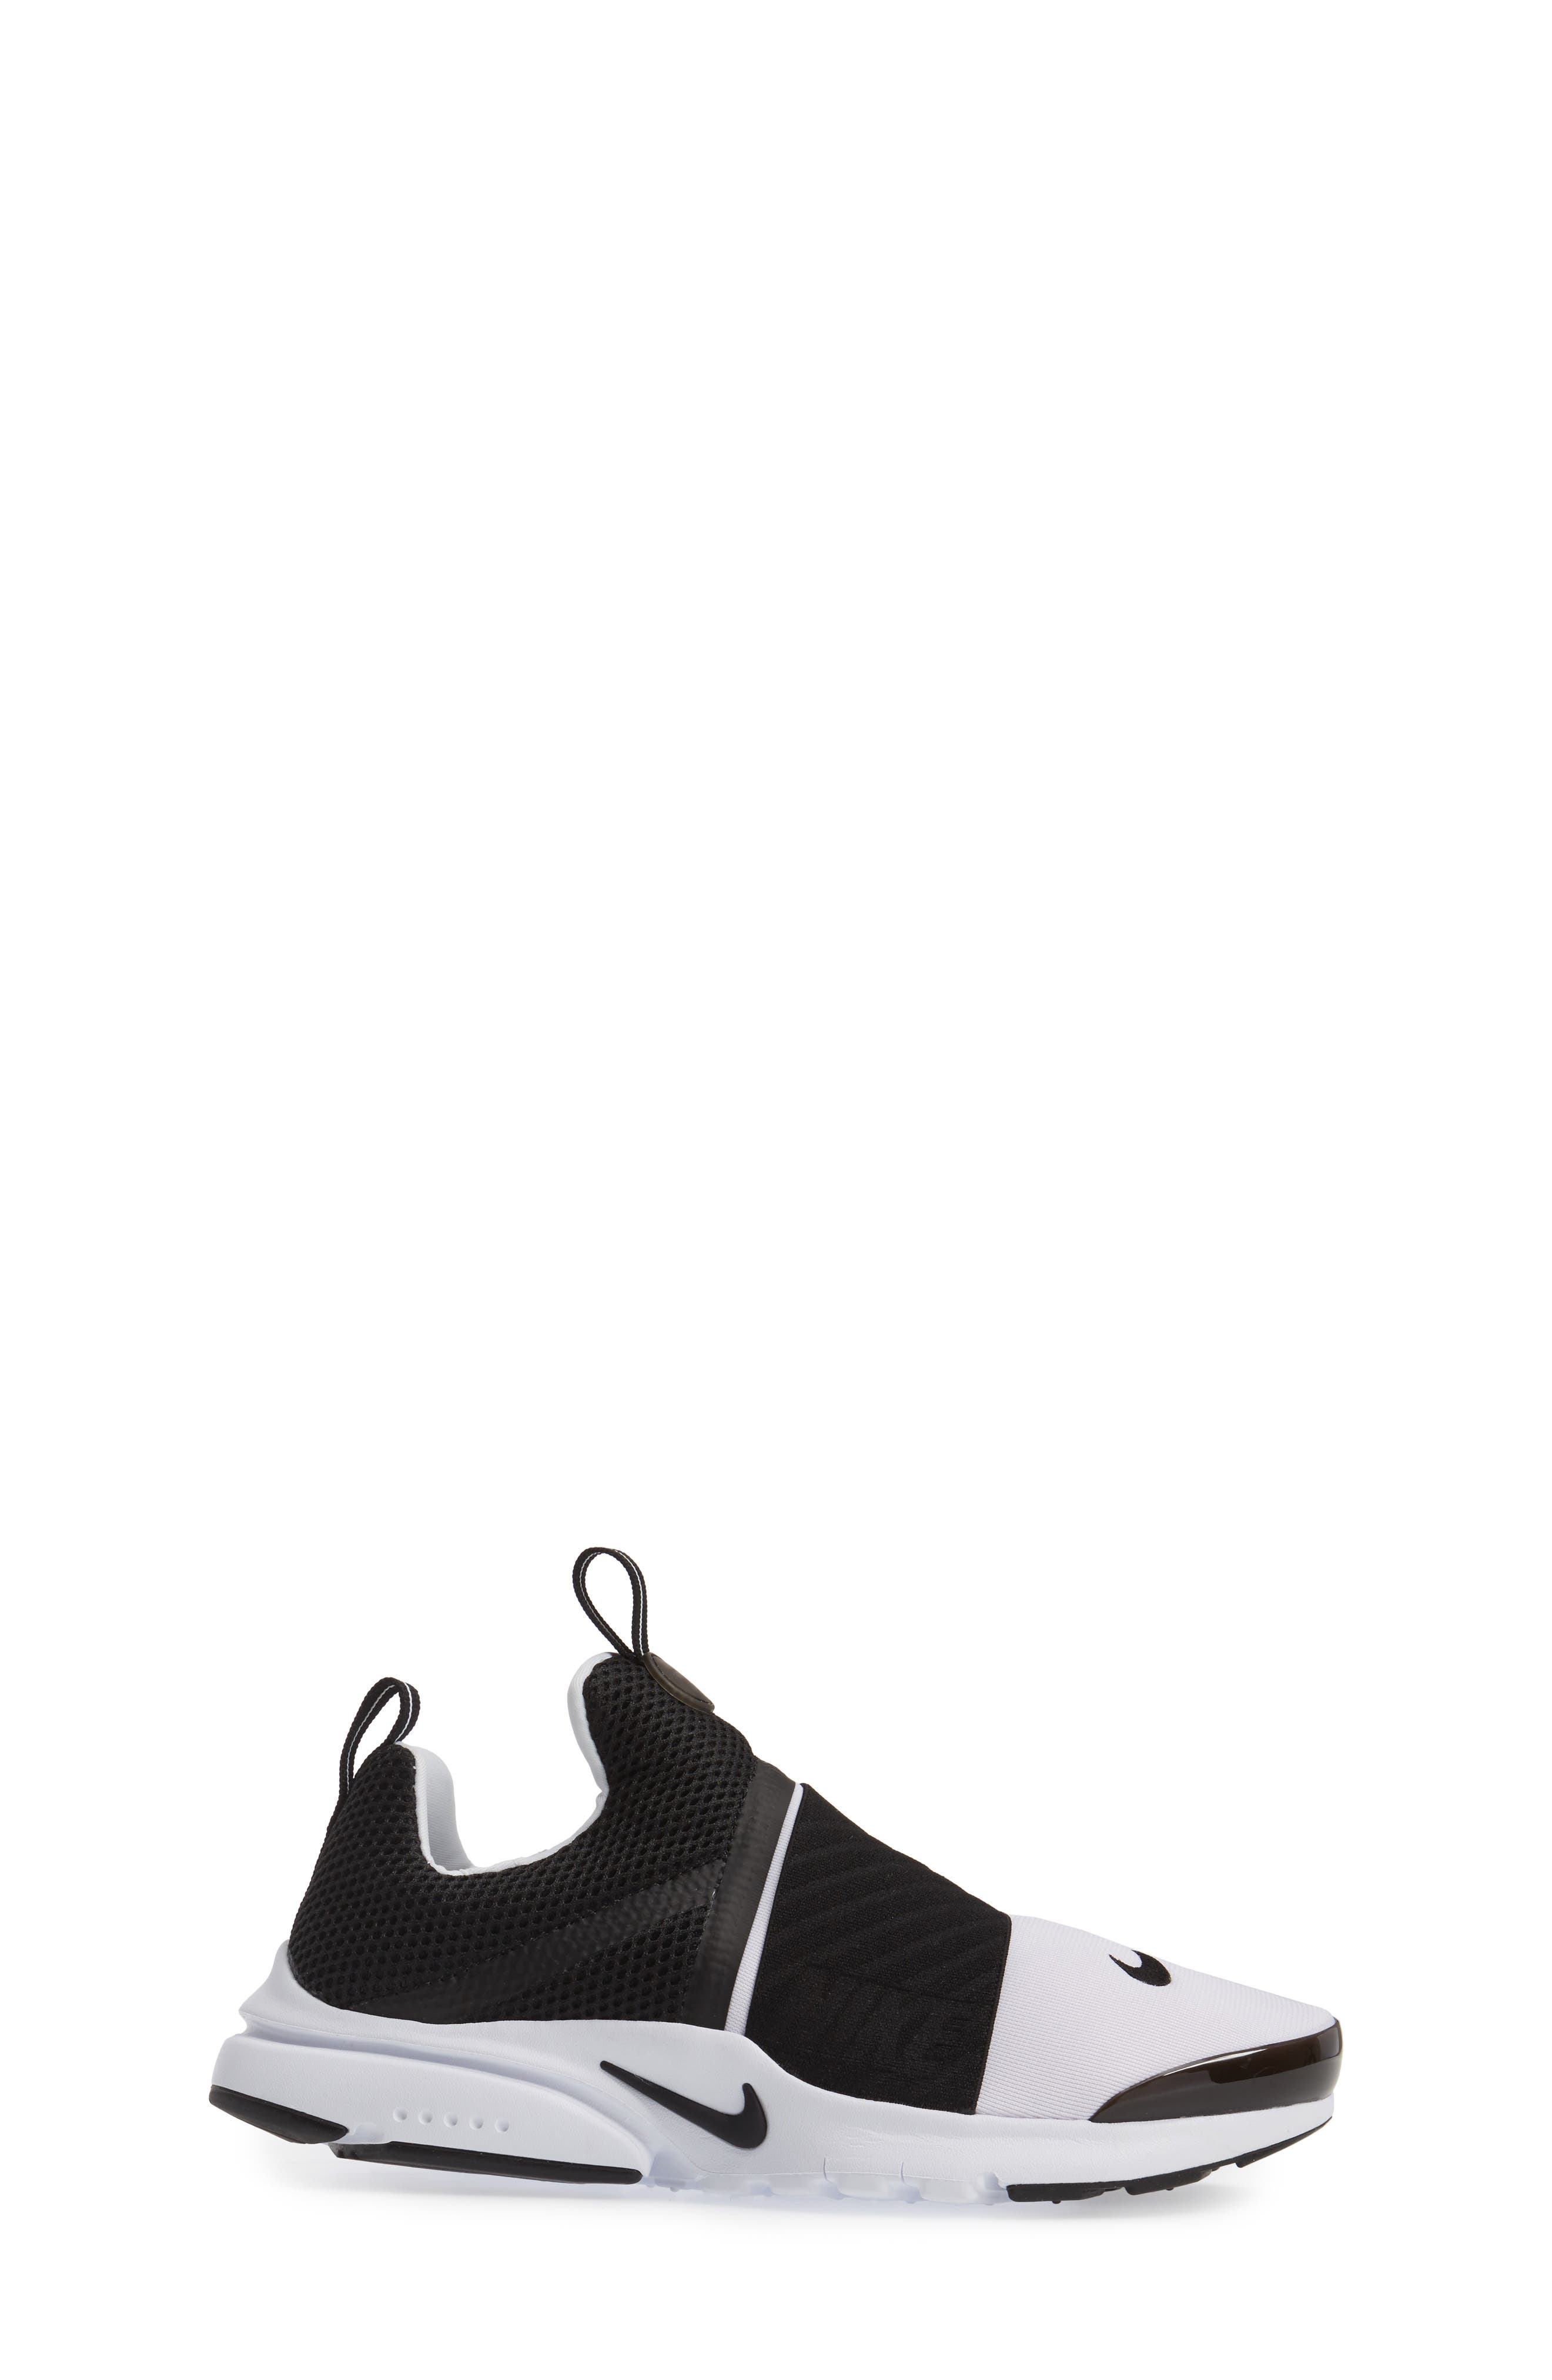 Presto Extreme Sneaker,                             Alternate thumbnail 29, color,